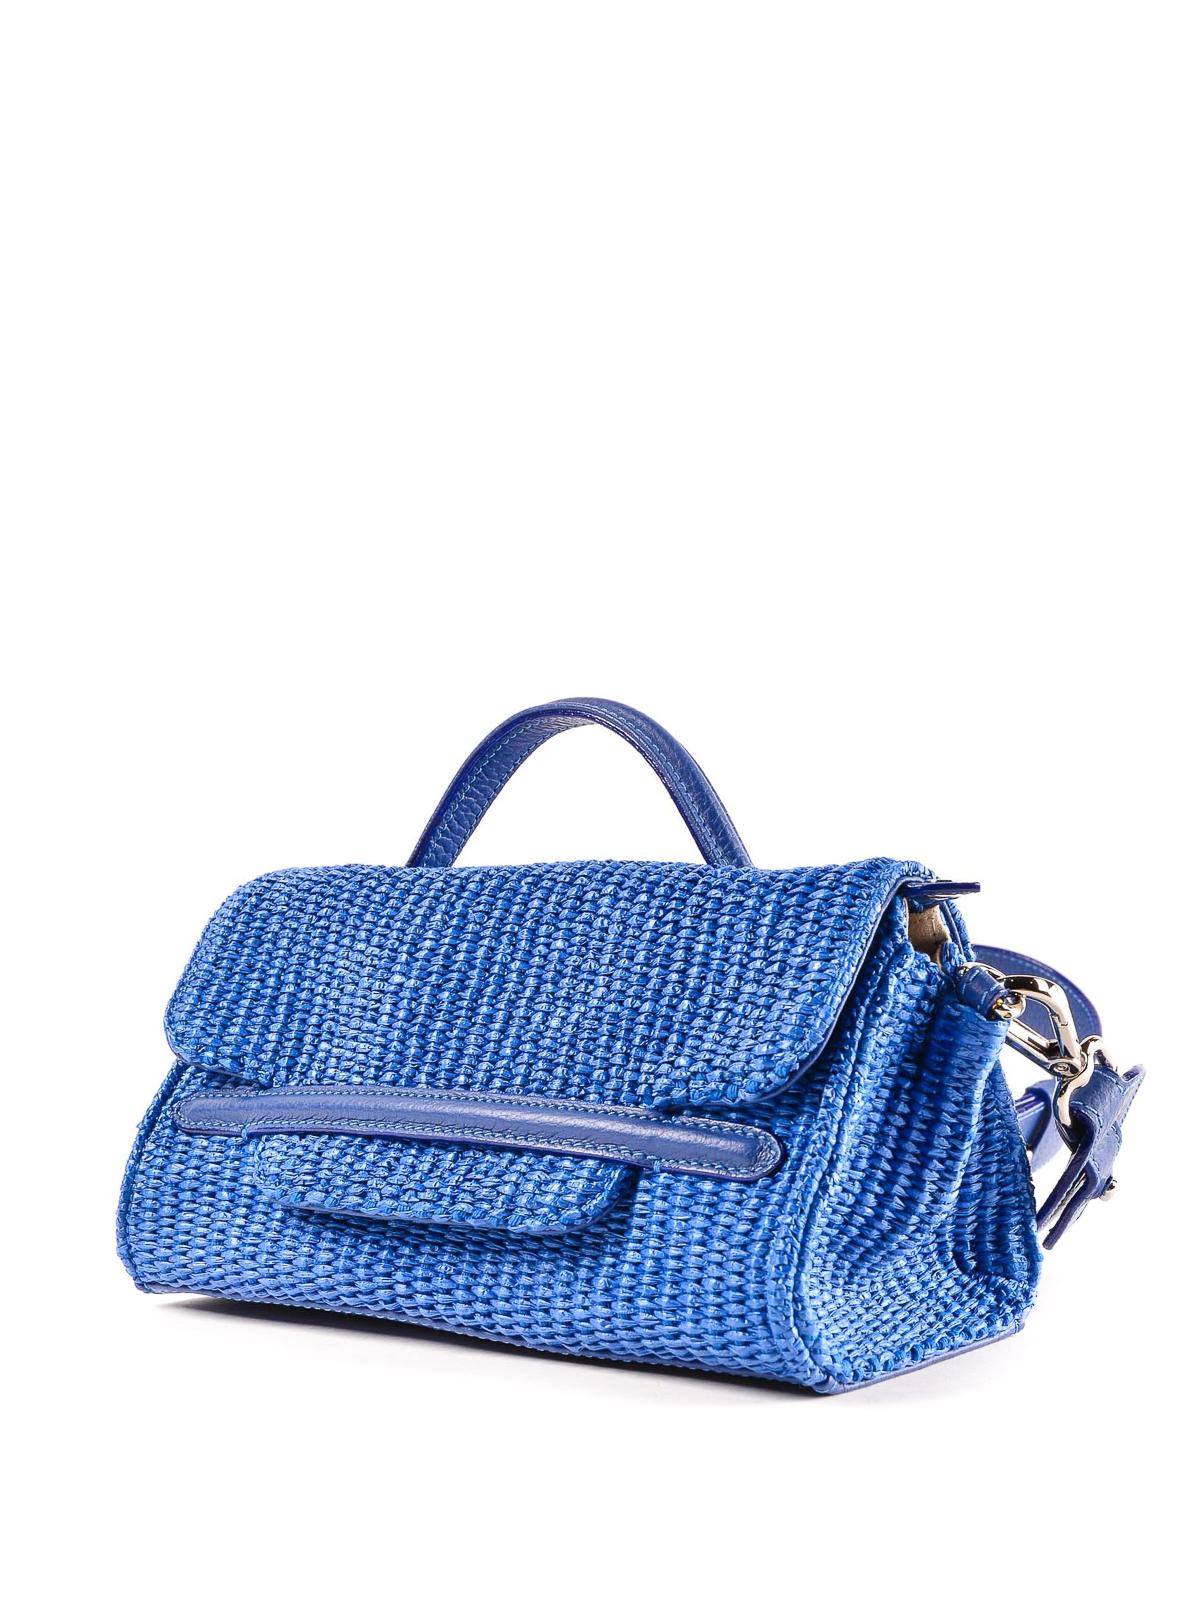 Zanellato Nina Baby Fiascaia dark blue bag RwCTtIXbr3